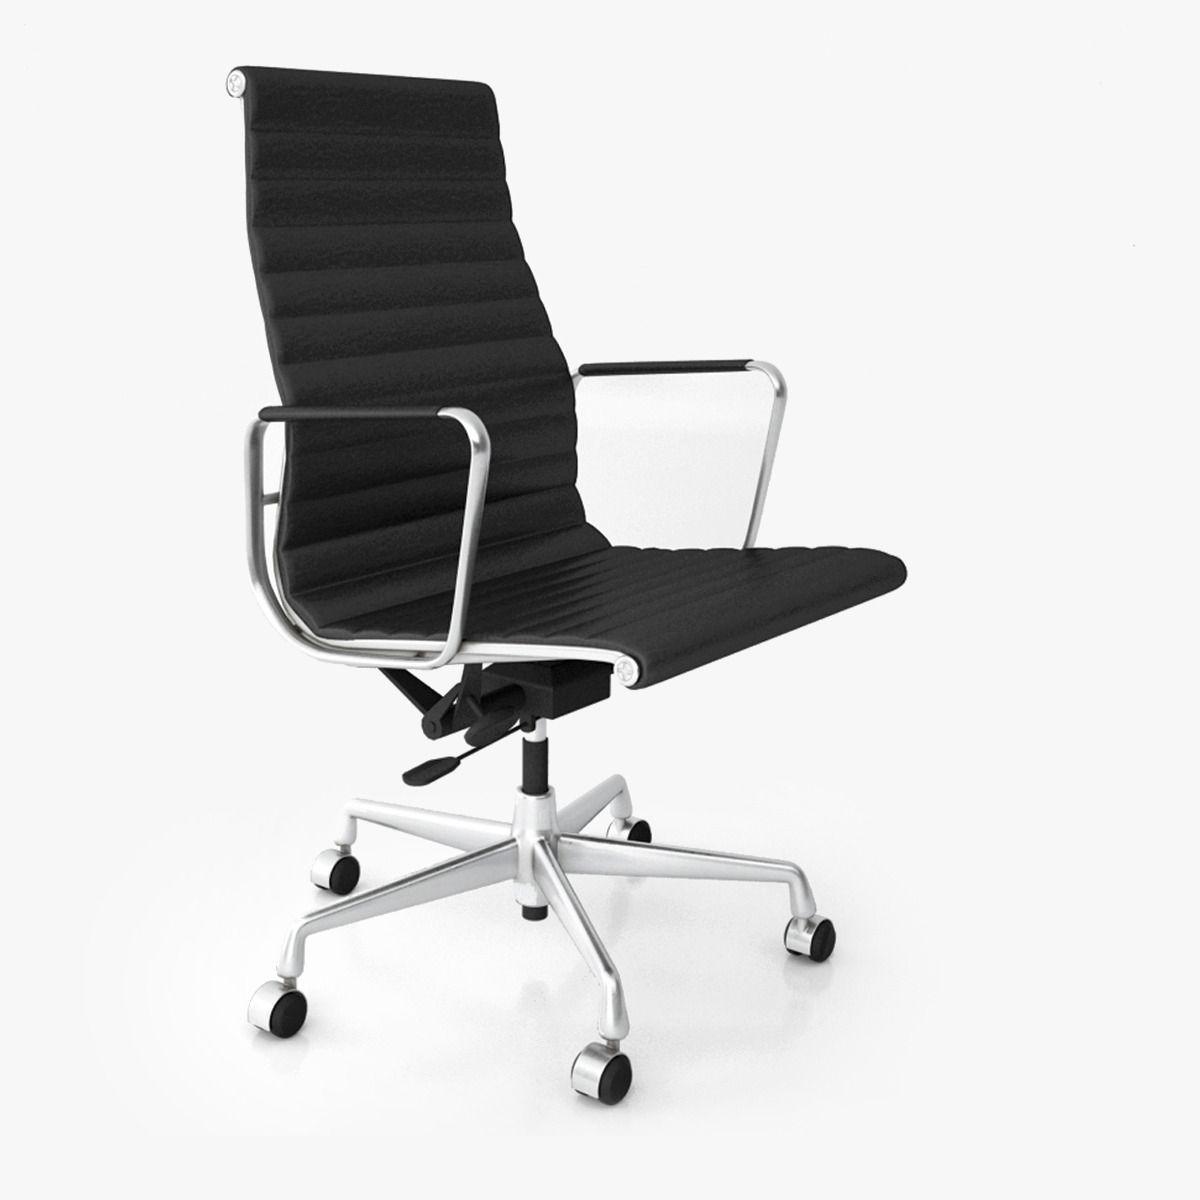 Vitra Aluminium Office Chairs 3d Model Max Obj Fbx 2